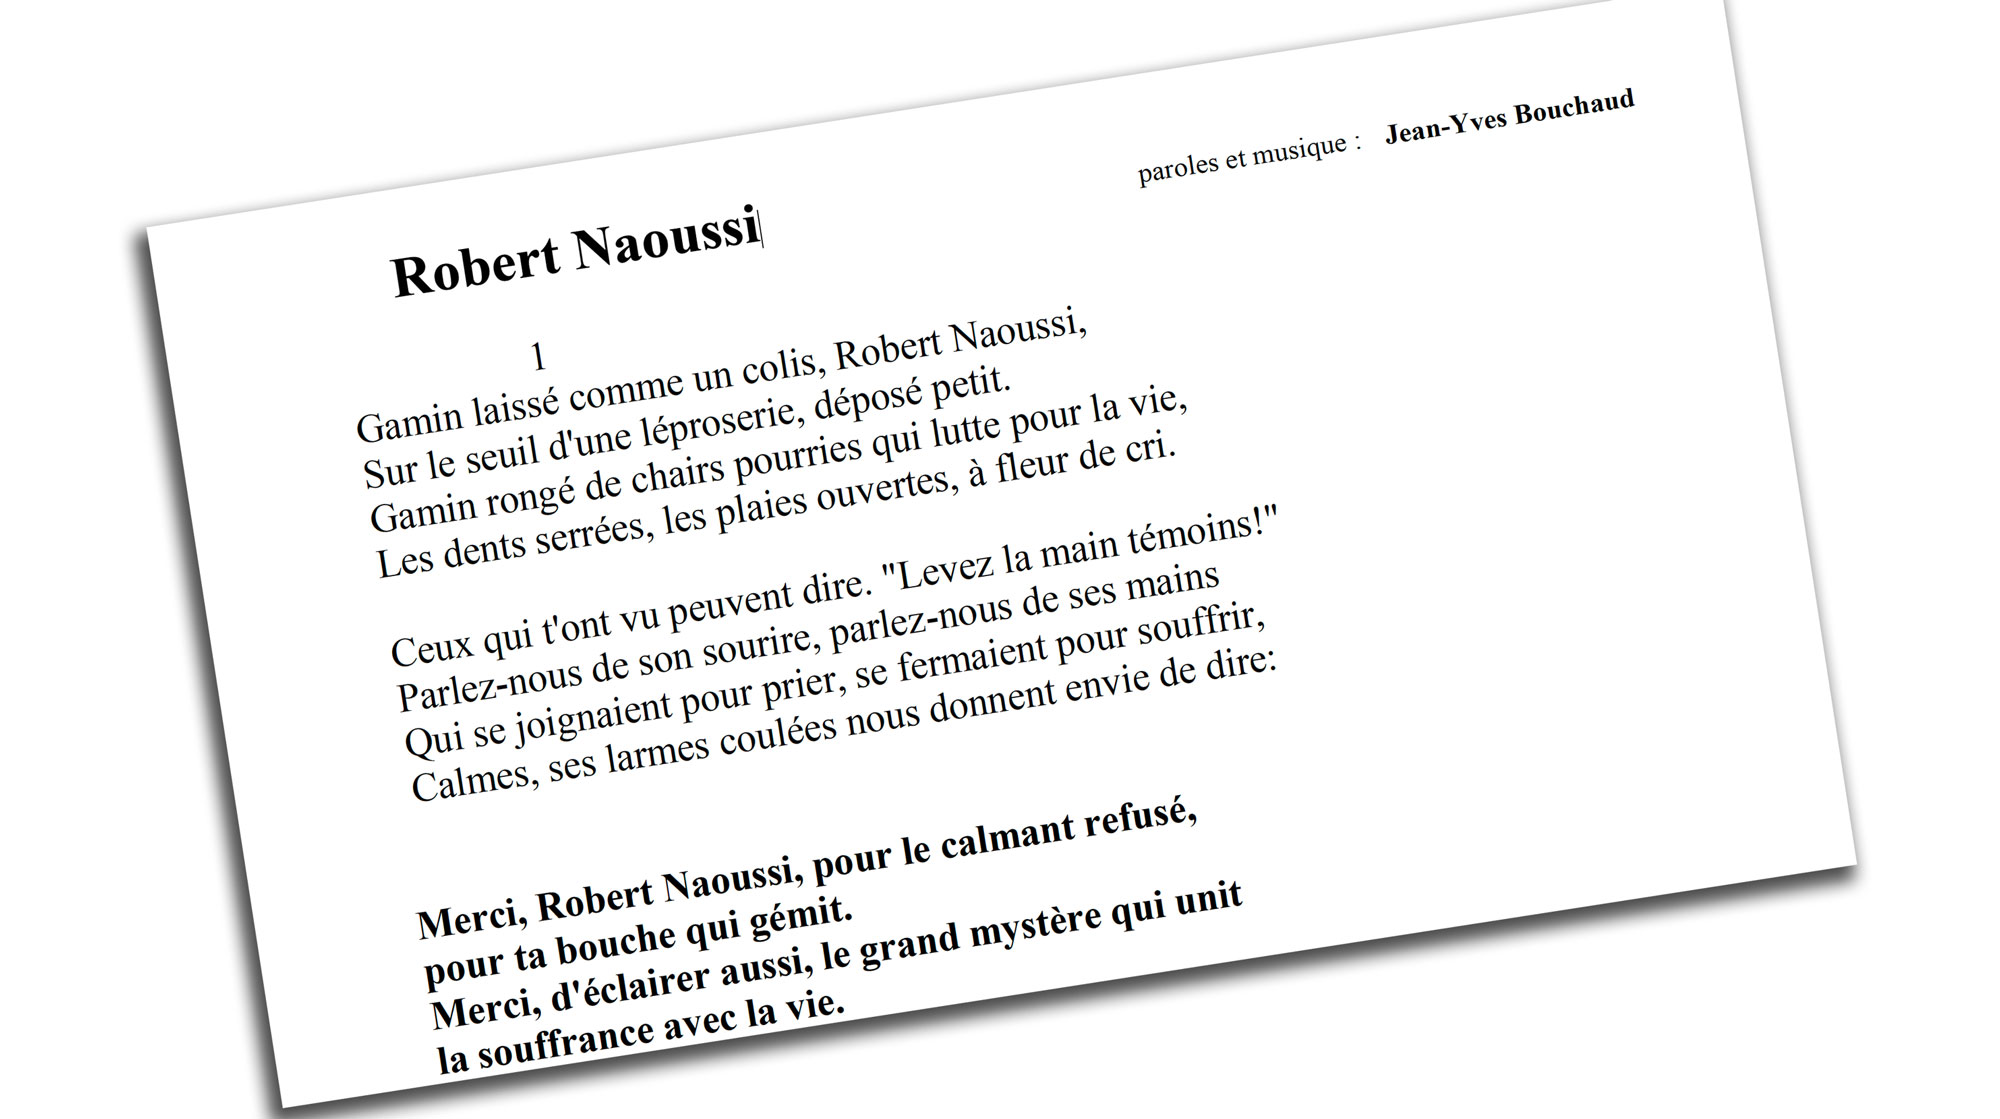 chanson Jean-Yves Bouchaud